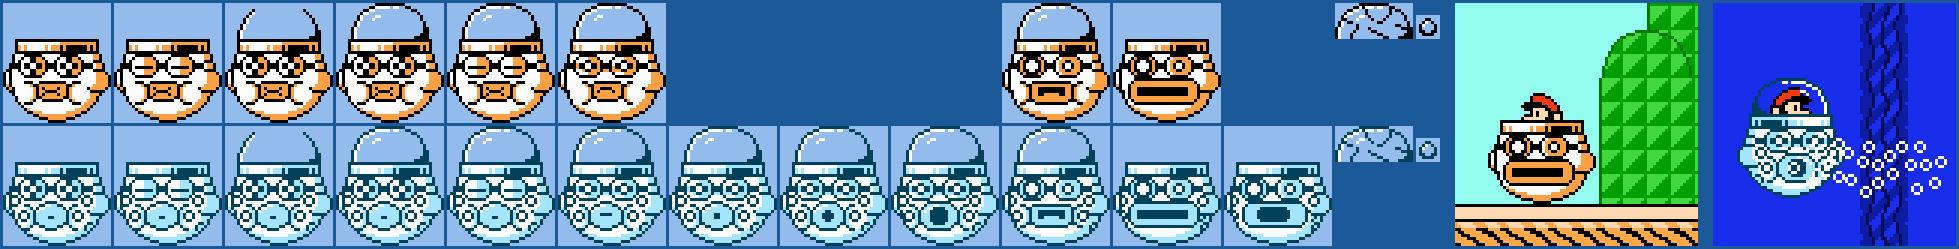 Koopa Clown Submarine and Koopa Sub Bubbler